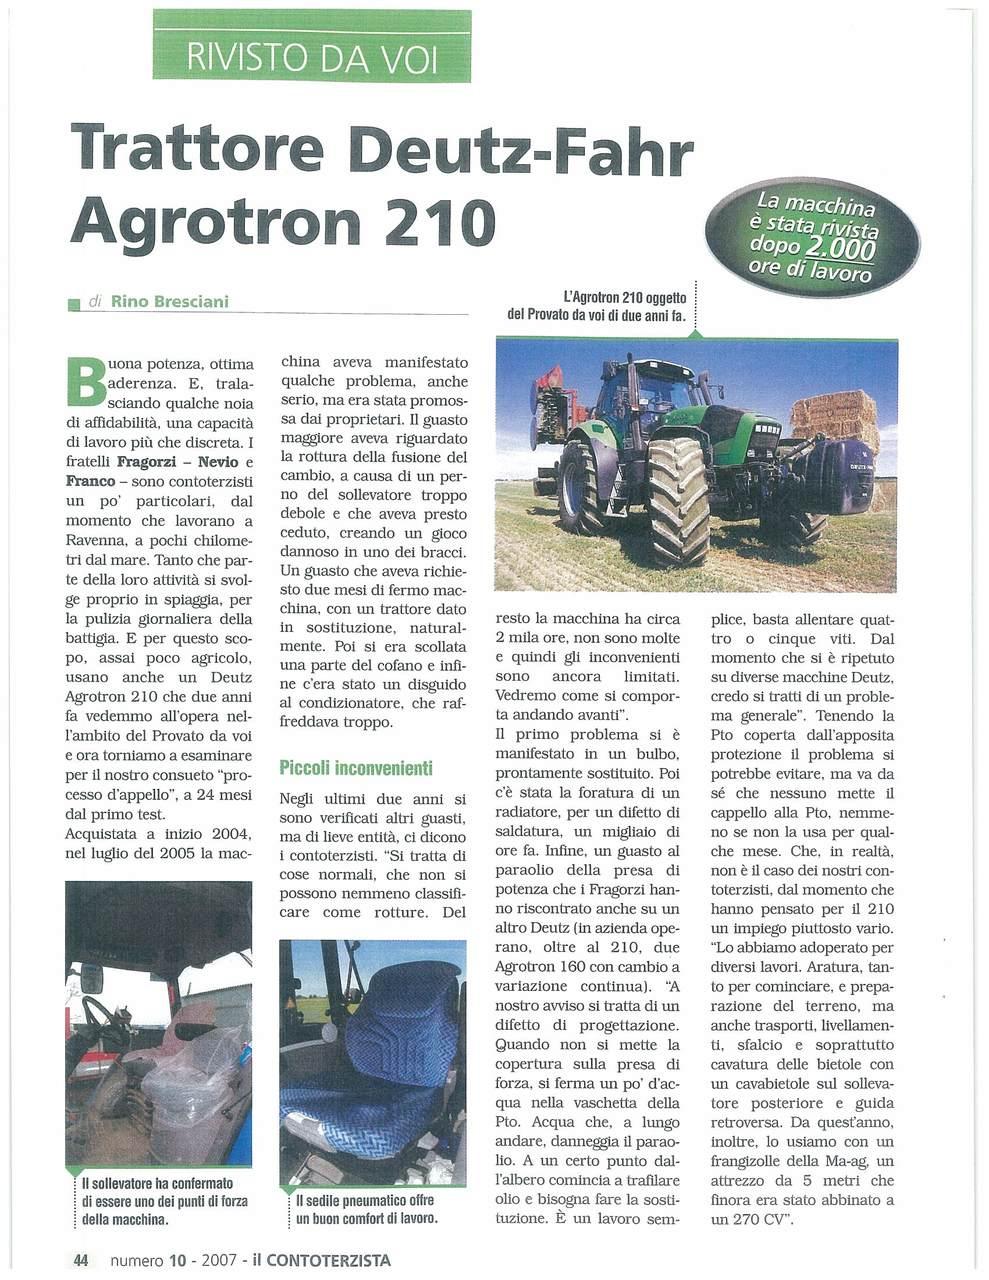 Trattore Deutz-Fahr Agrotron 210